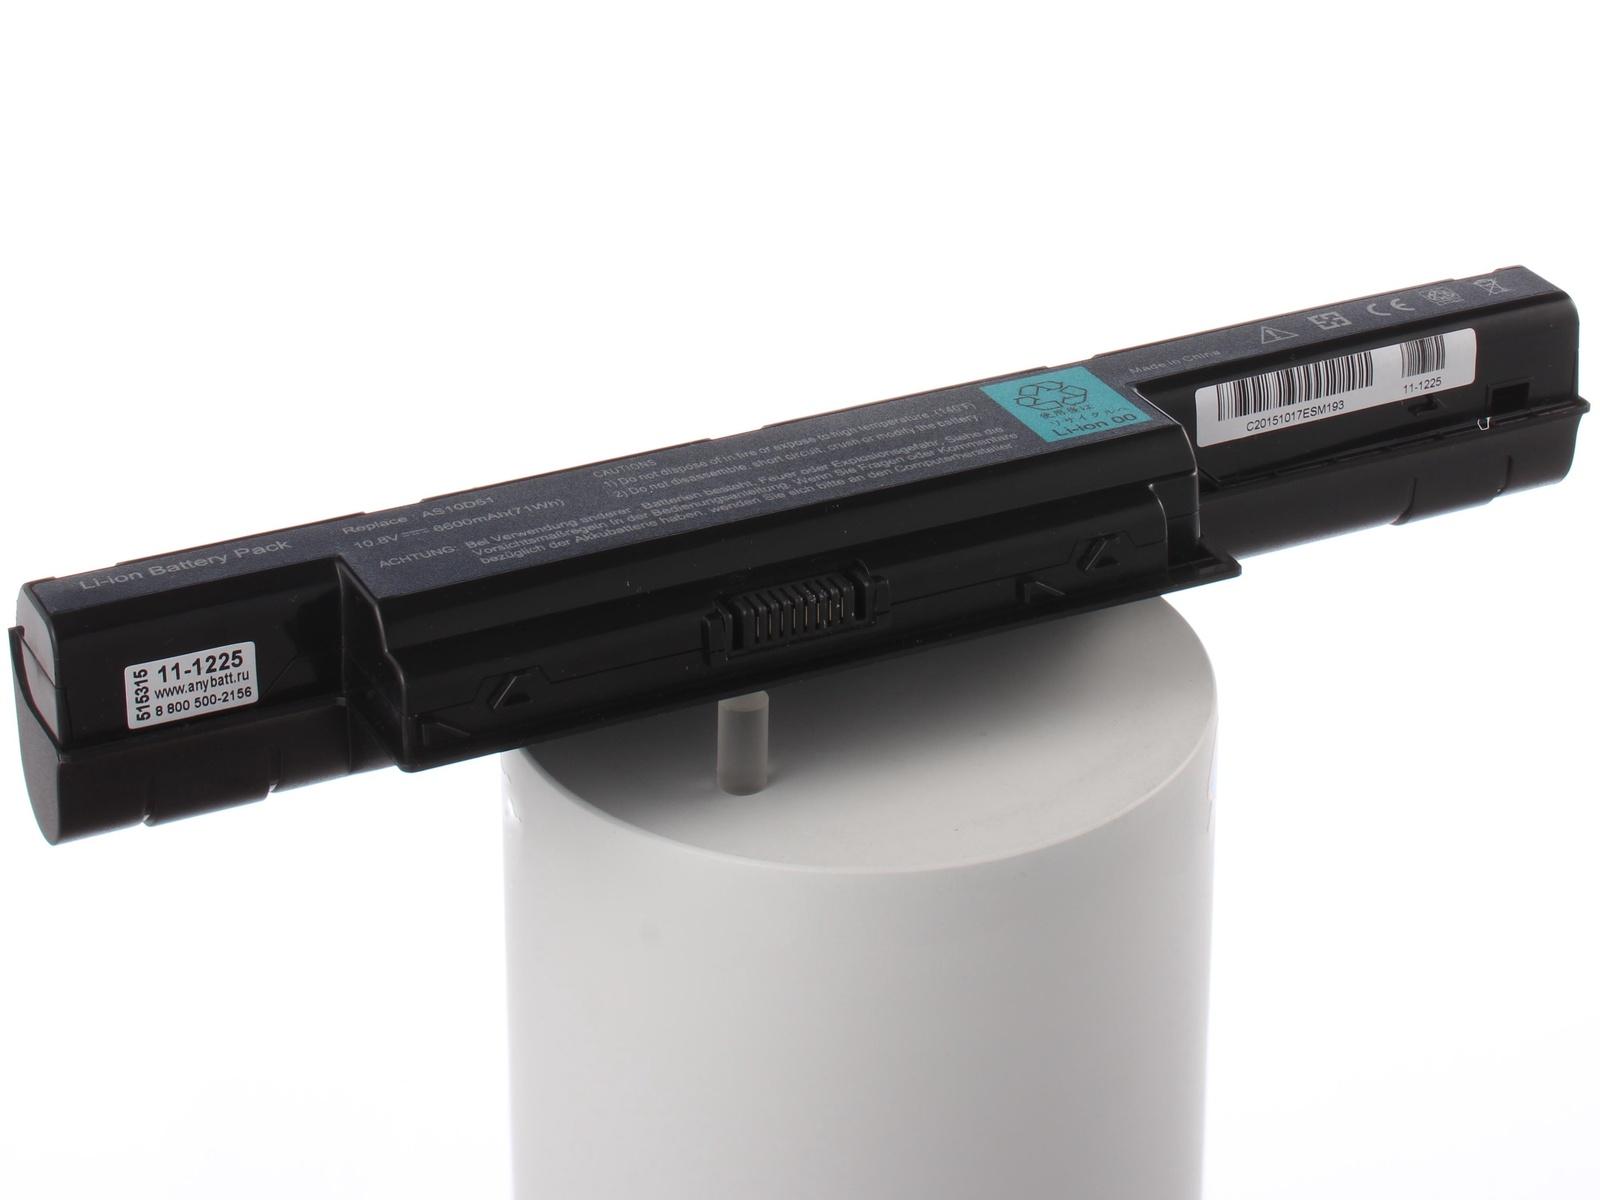 Аккумулятор для ноутбука AnyBatt для Acer Aspire 7750G-2354G64Mnkk, Aspire 7750ZG-B962G32Mnkk, Aspire E1-530-21174G75MN, Aspire E1-531-B822G50Mnks, Aspire E1-531G-B9604G75Ma, Aspire E1-570-33214G75Mnkk, Aspire E1-571-33114G50Mnks мебель e1